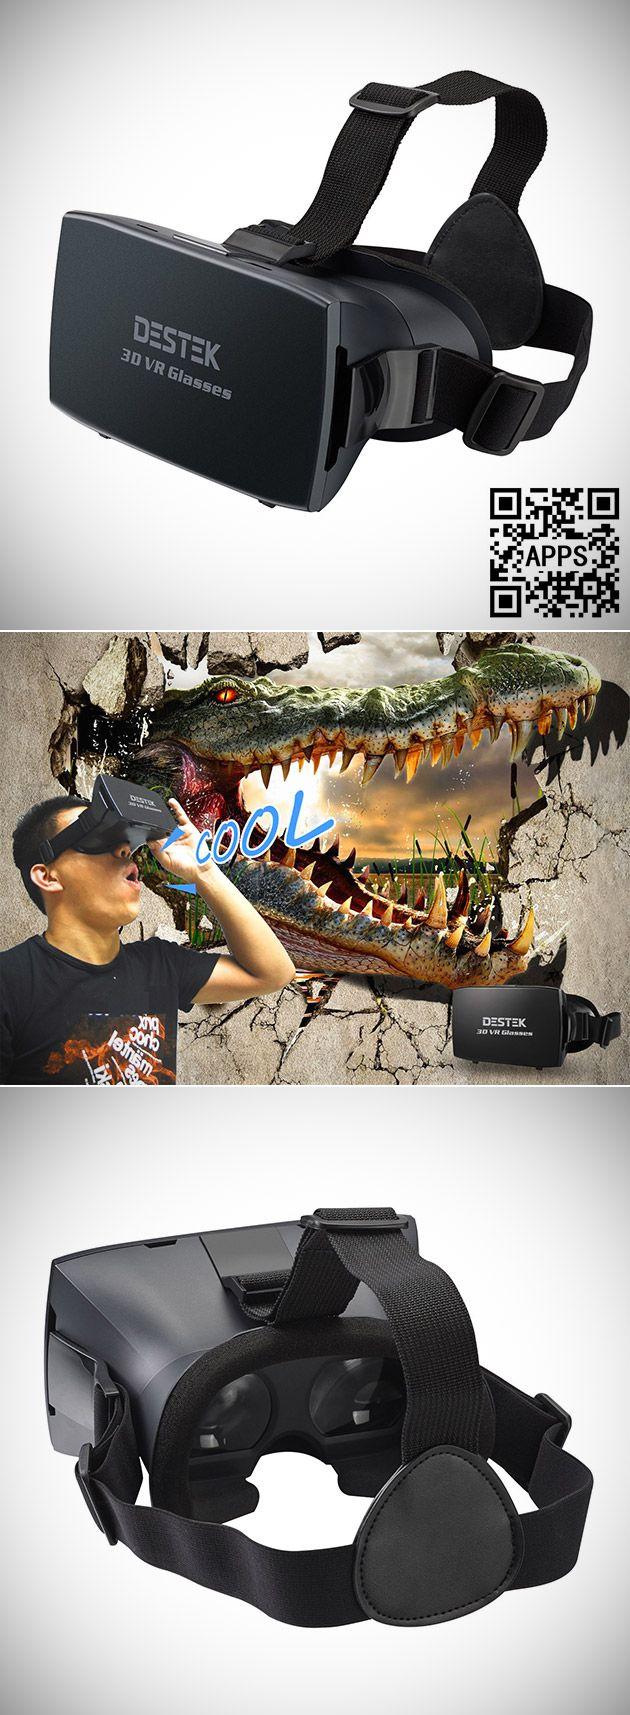 Destek 3-D VR Glasses http://www.amazon.com/s/ref=nb_sb_noss_2?url=search-alias%3Delectronics&field-keywords=DESTEK+3D+VR&rh=n%3A172282%2Ck%3ADESTEK+3D+VR